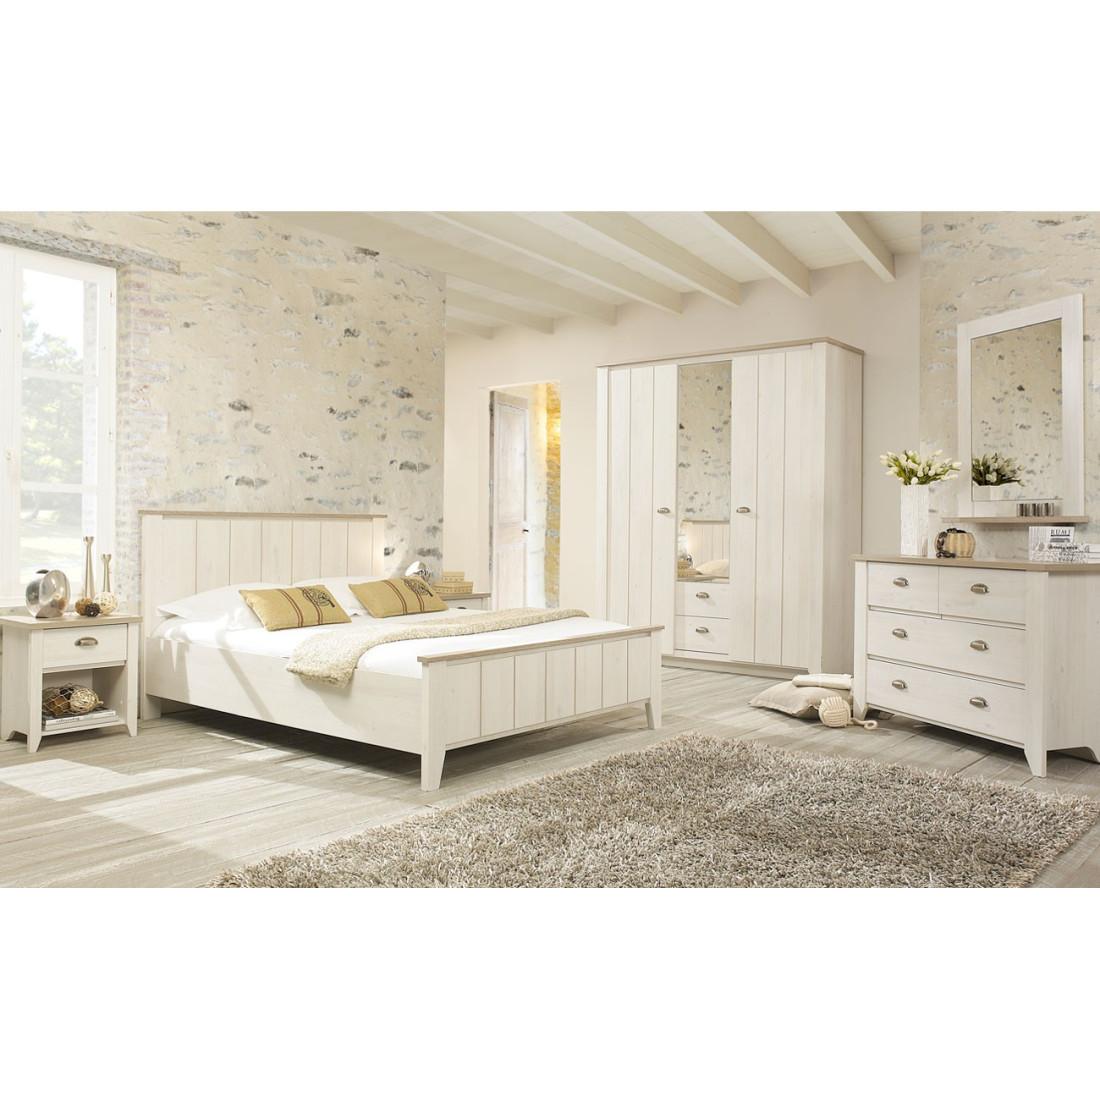 cadre t te de lit 140 200 helene univers chambre. Black Bedroom Furniture Sets. Home Design Ideas